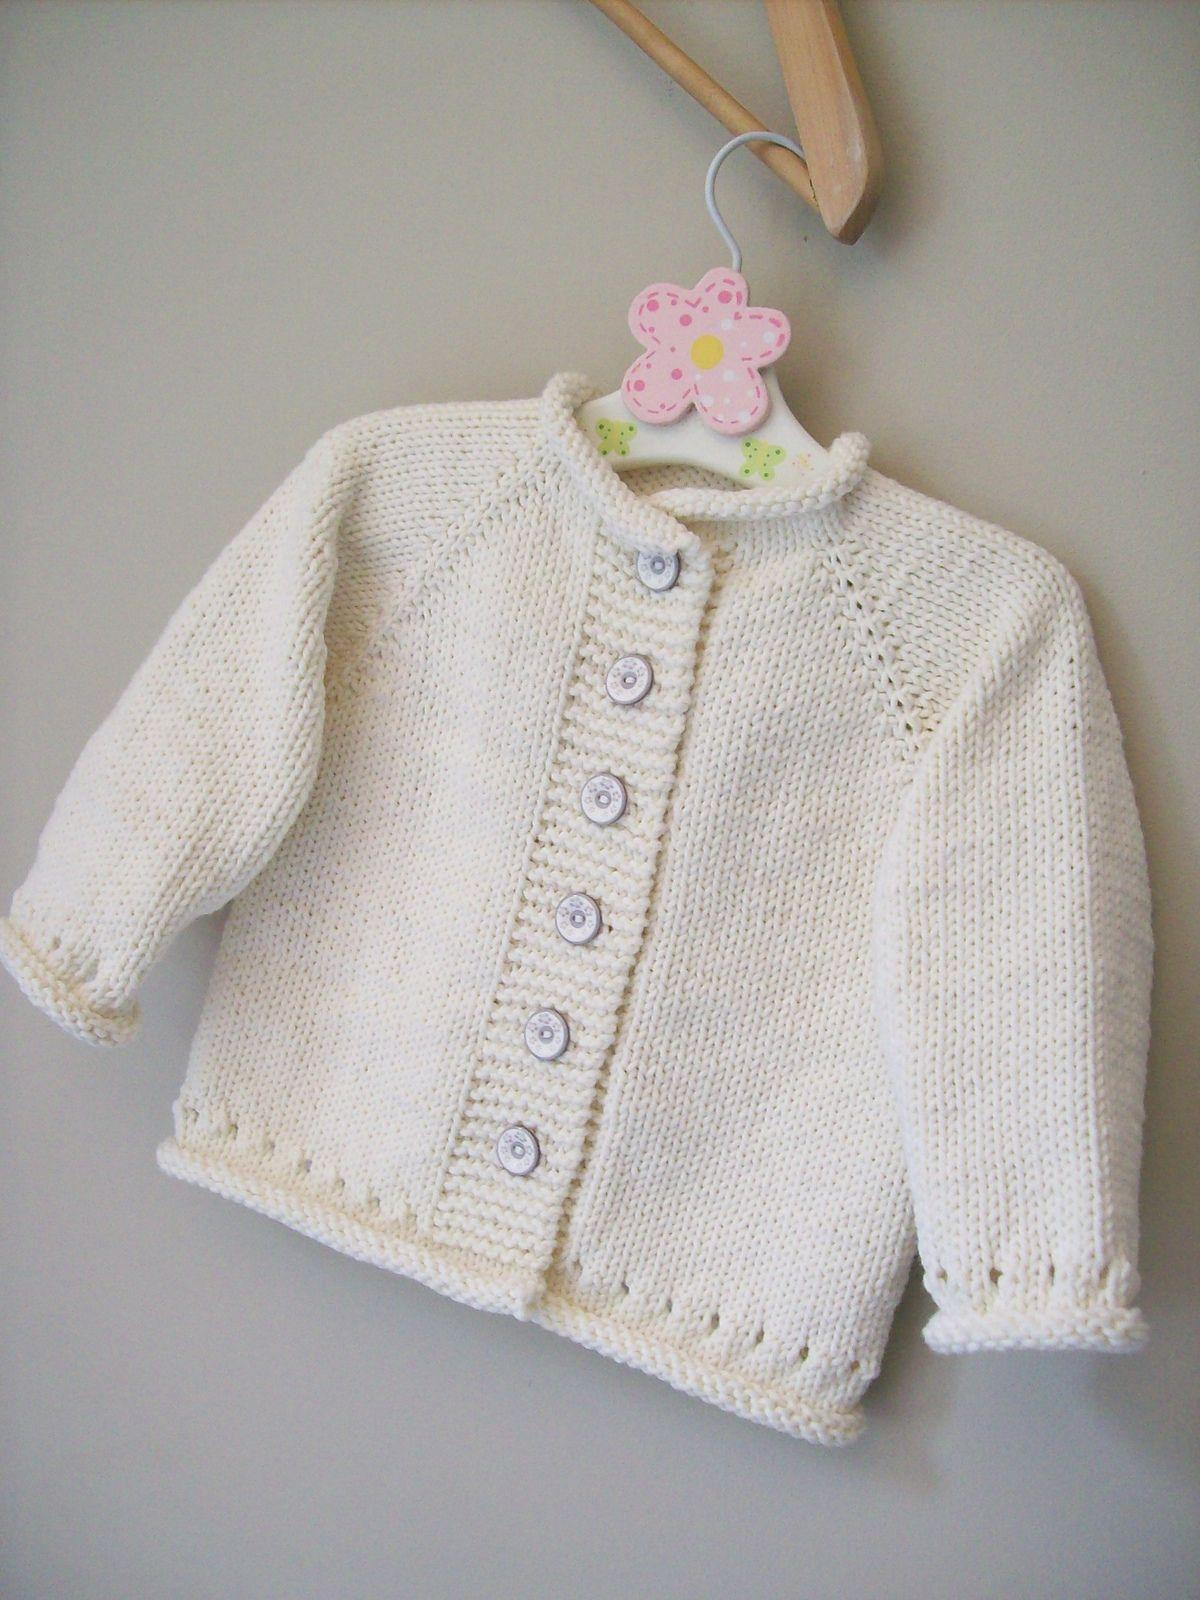 Cupid pattern by Melissa Schaschwary | Tejido, Bebe y Bebé